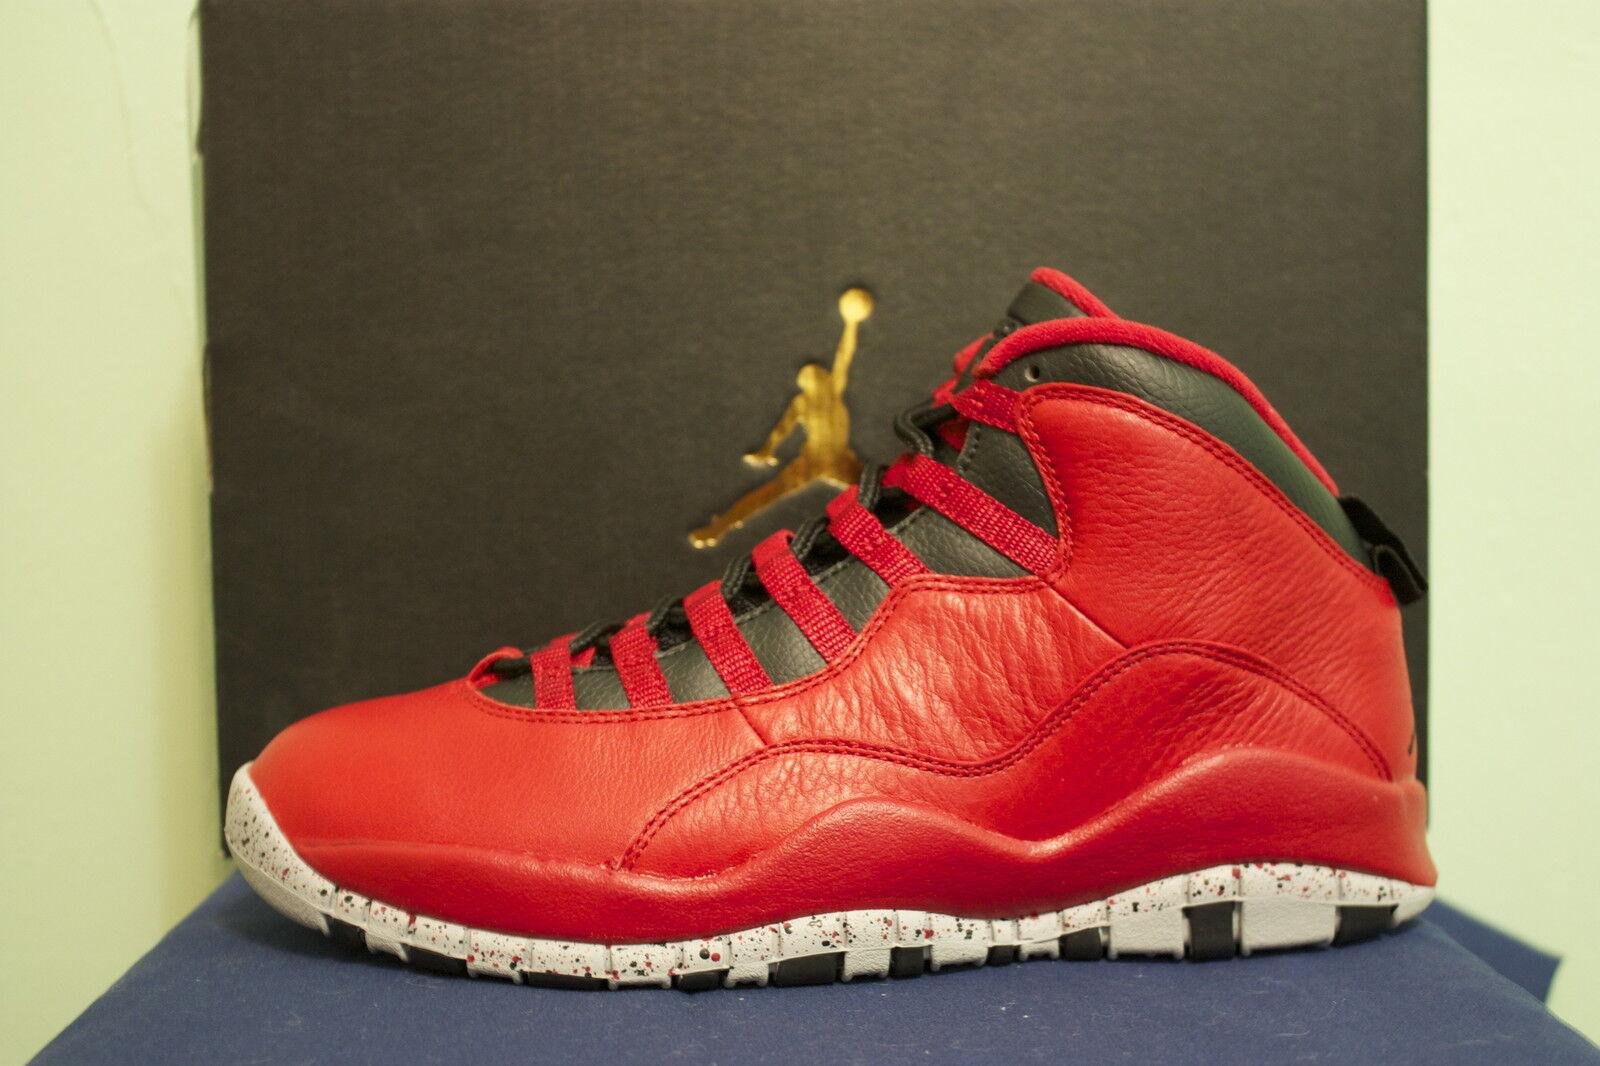 Nike Air Jordan Broadway 10 x toros sobre Broadway Jordan Rojo temporada retro cómodo despacho venta be5d10